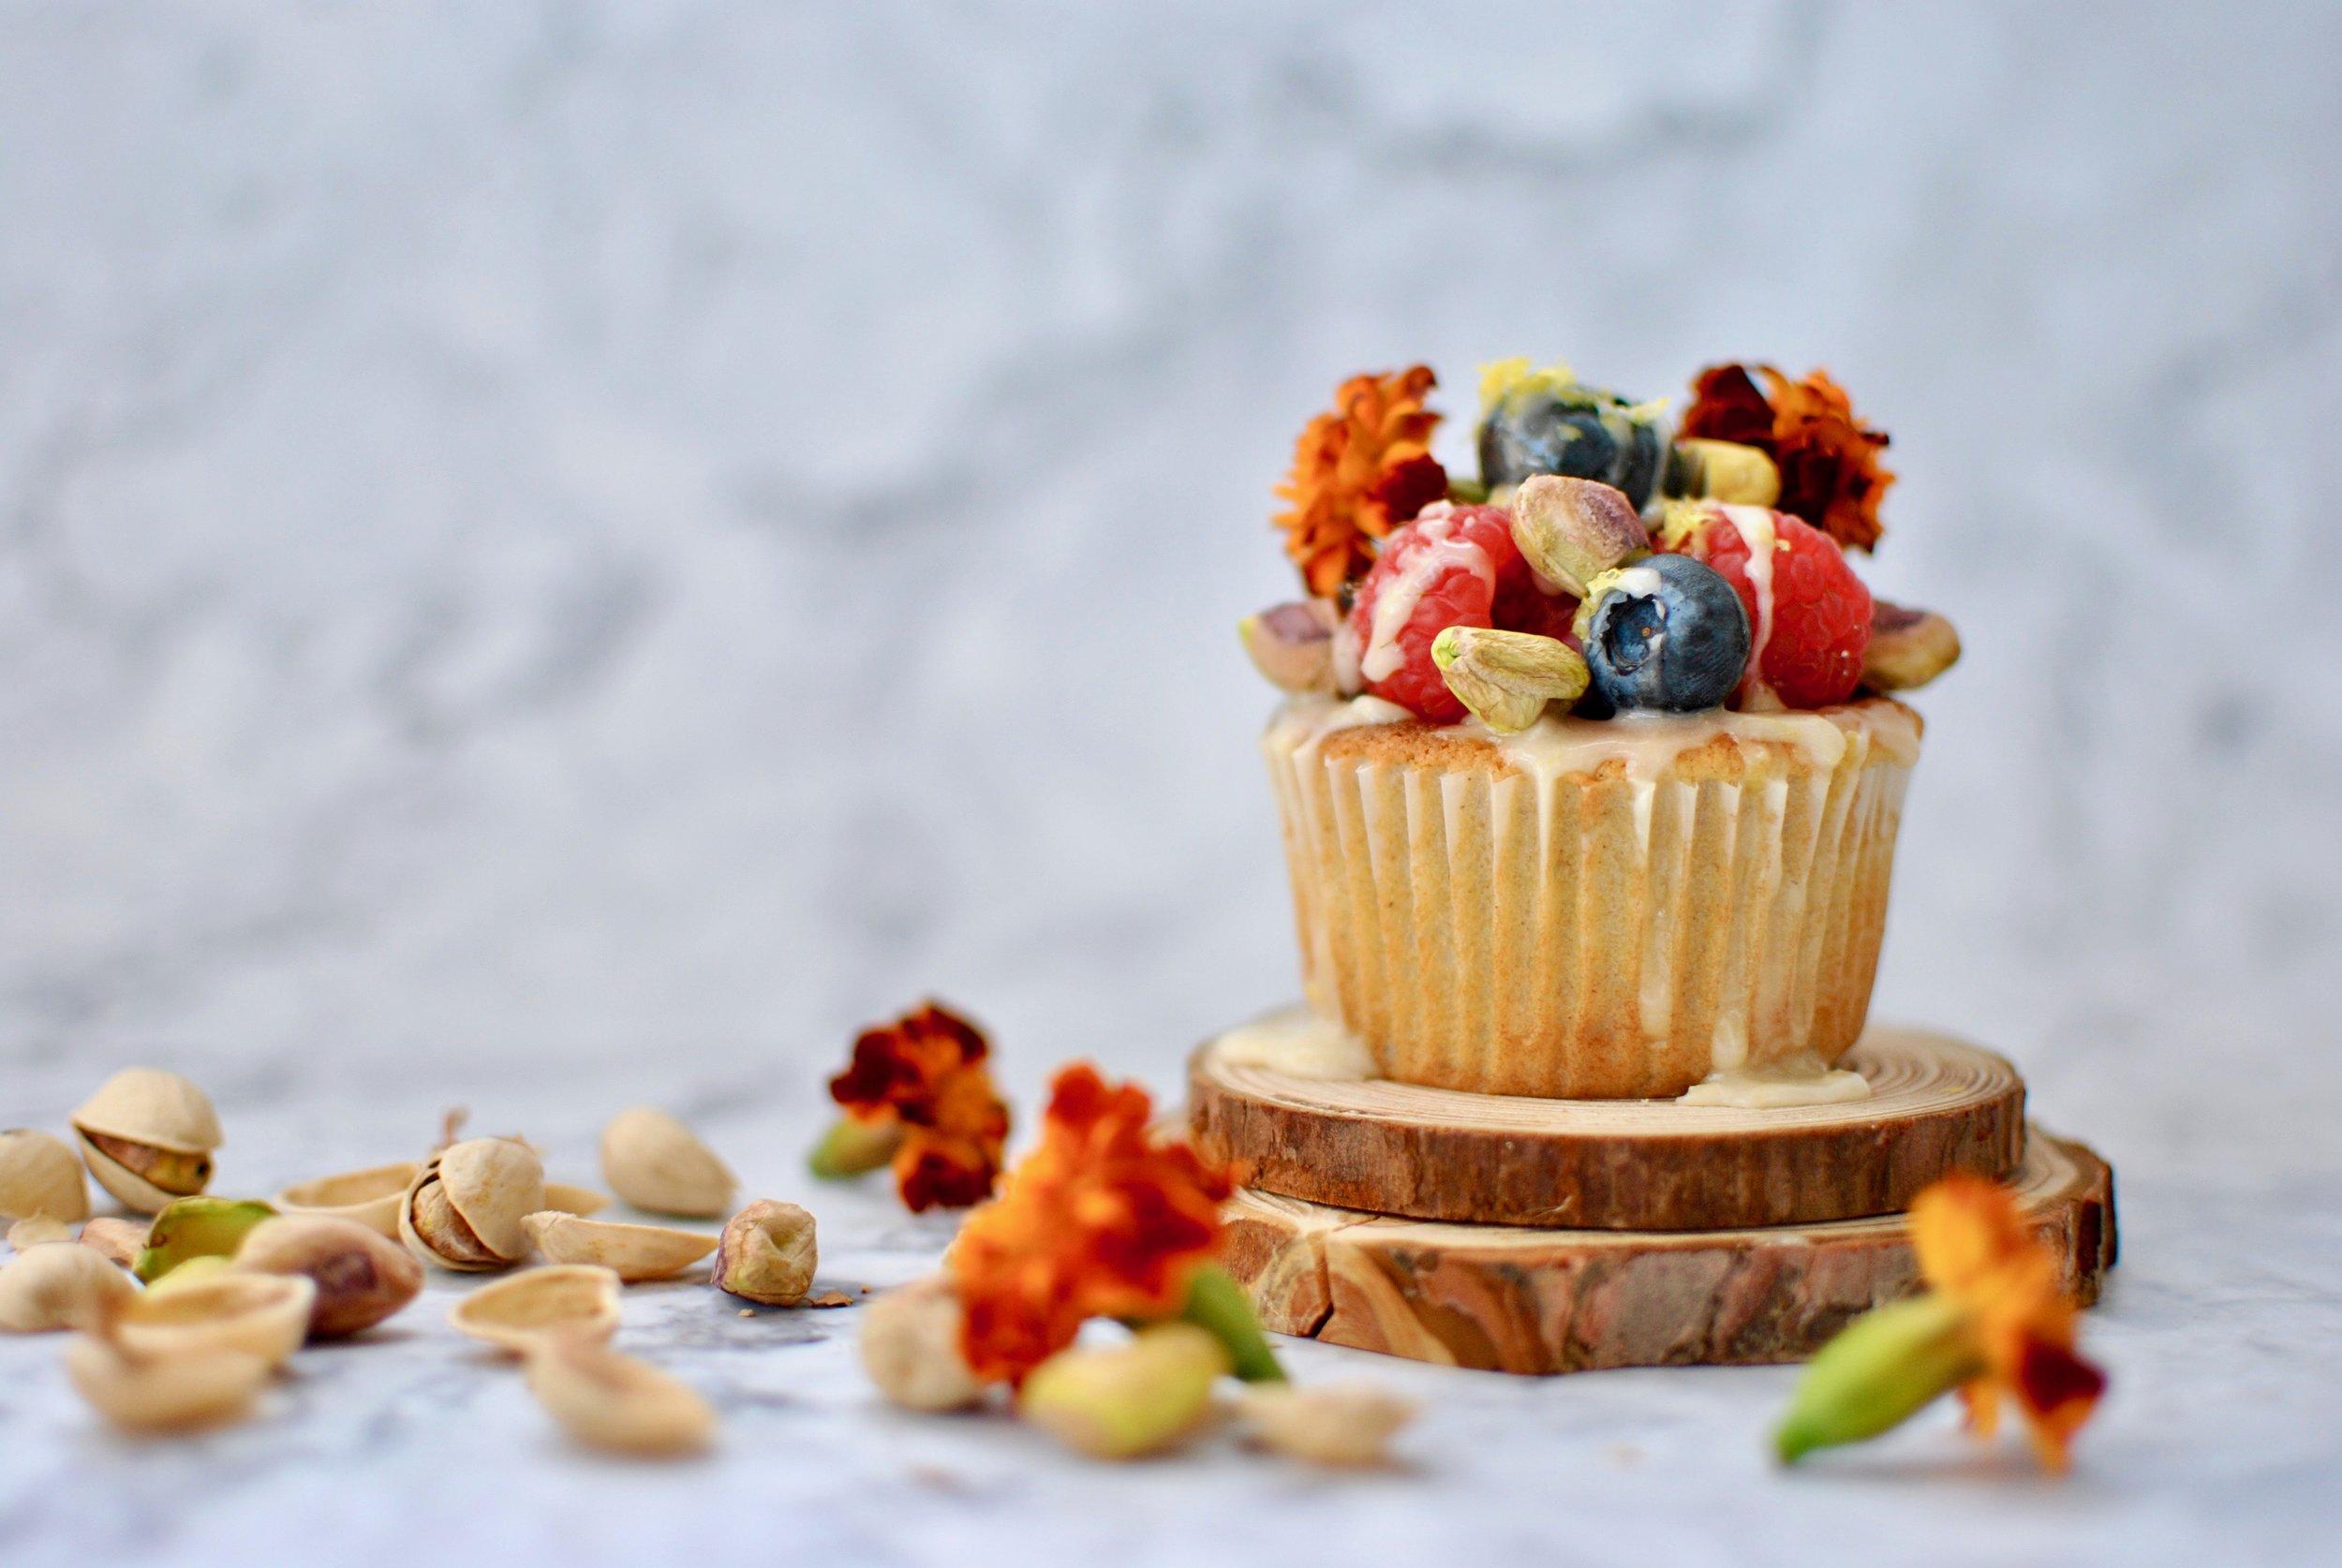 Cardamom pistachio muffins (GF, DF, Grain free) -